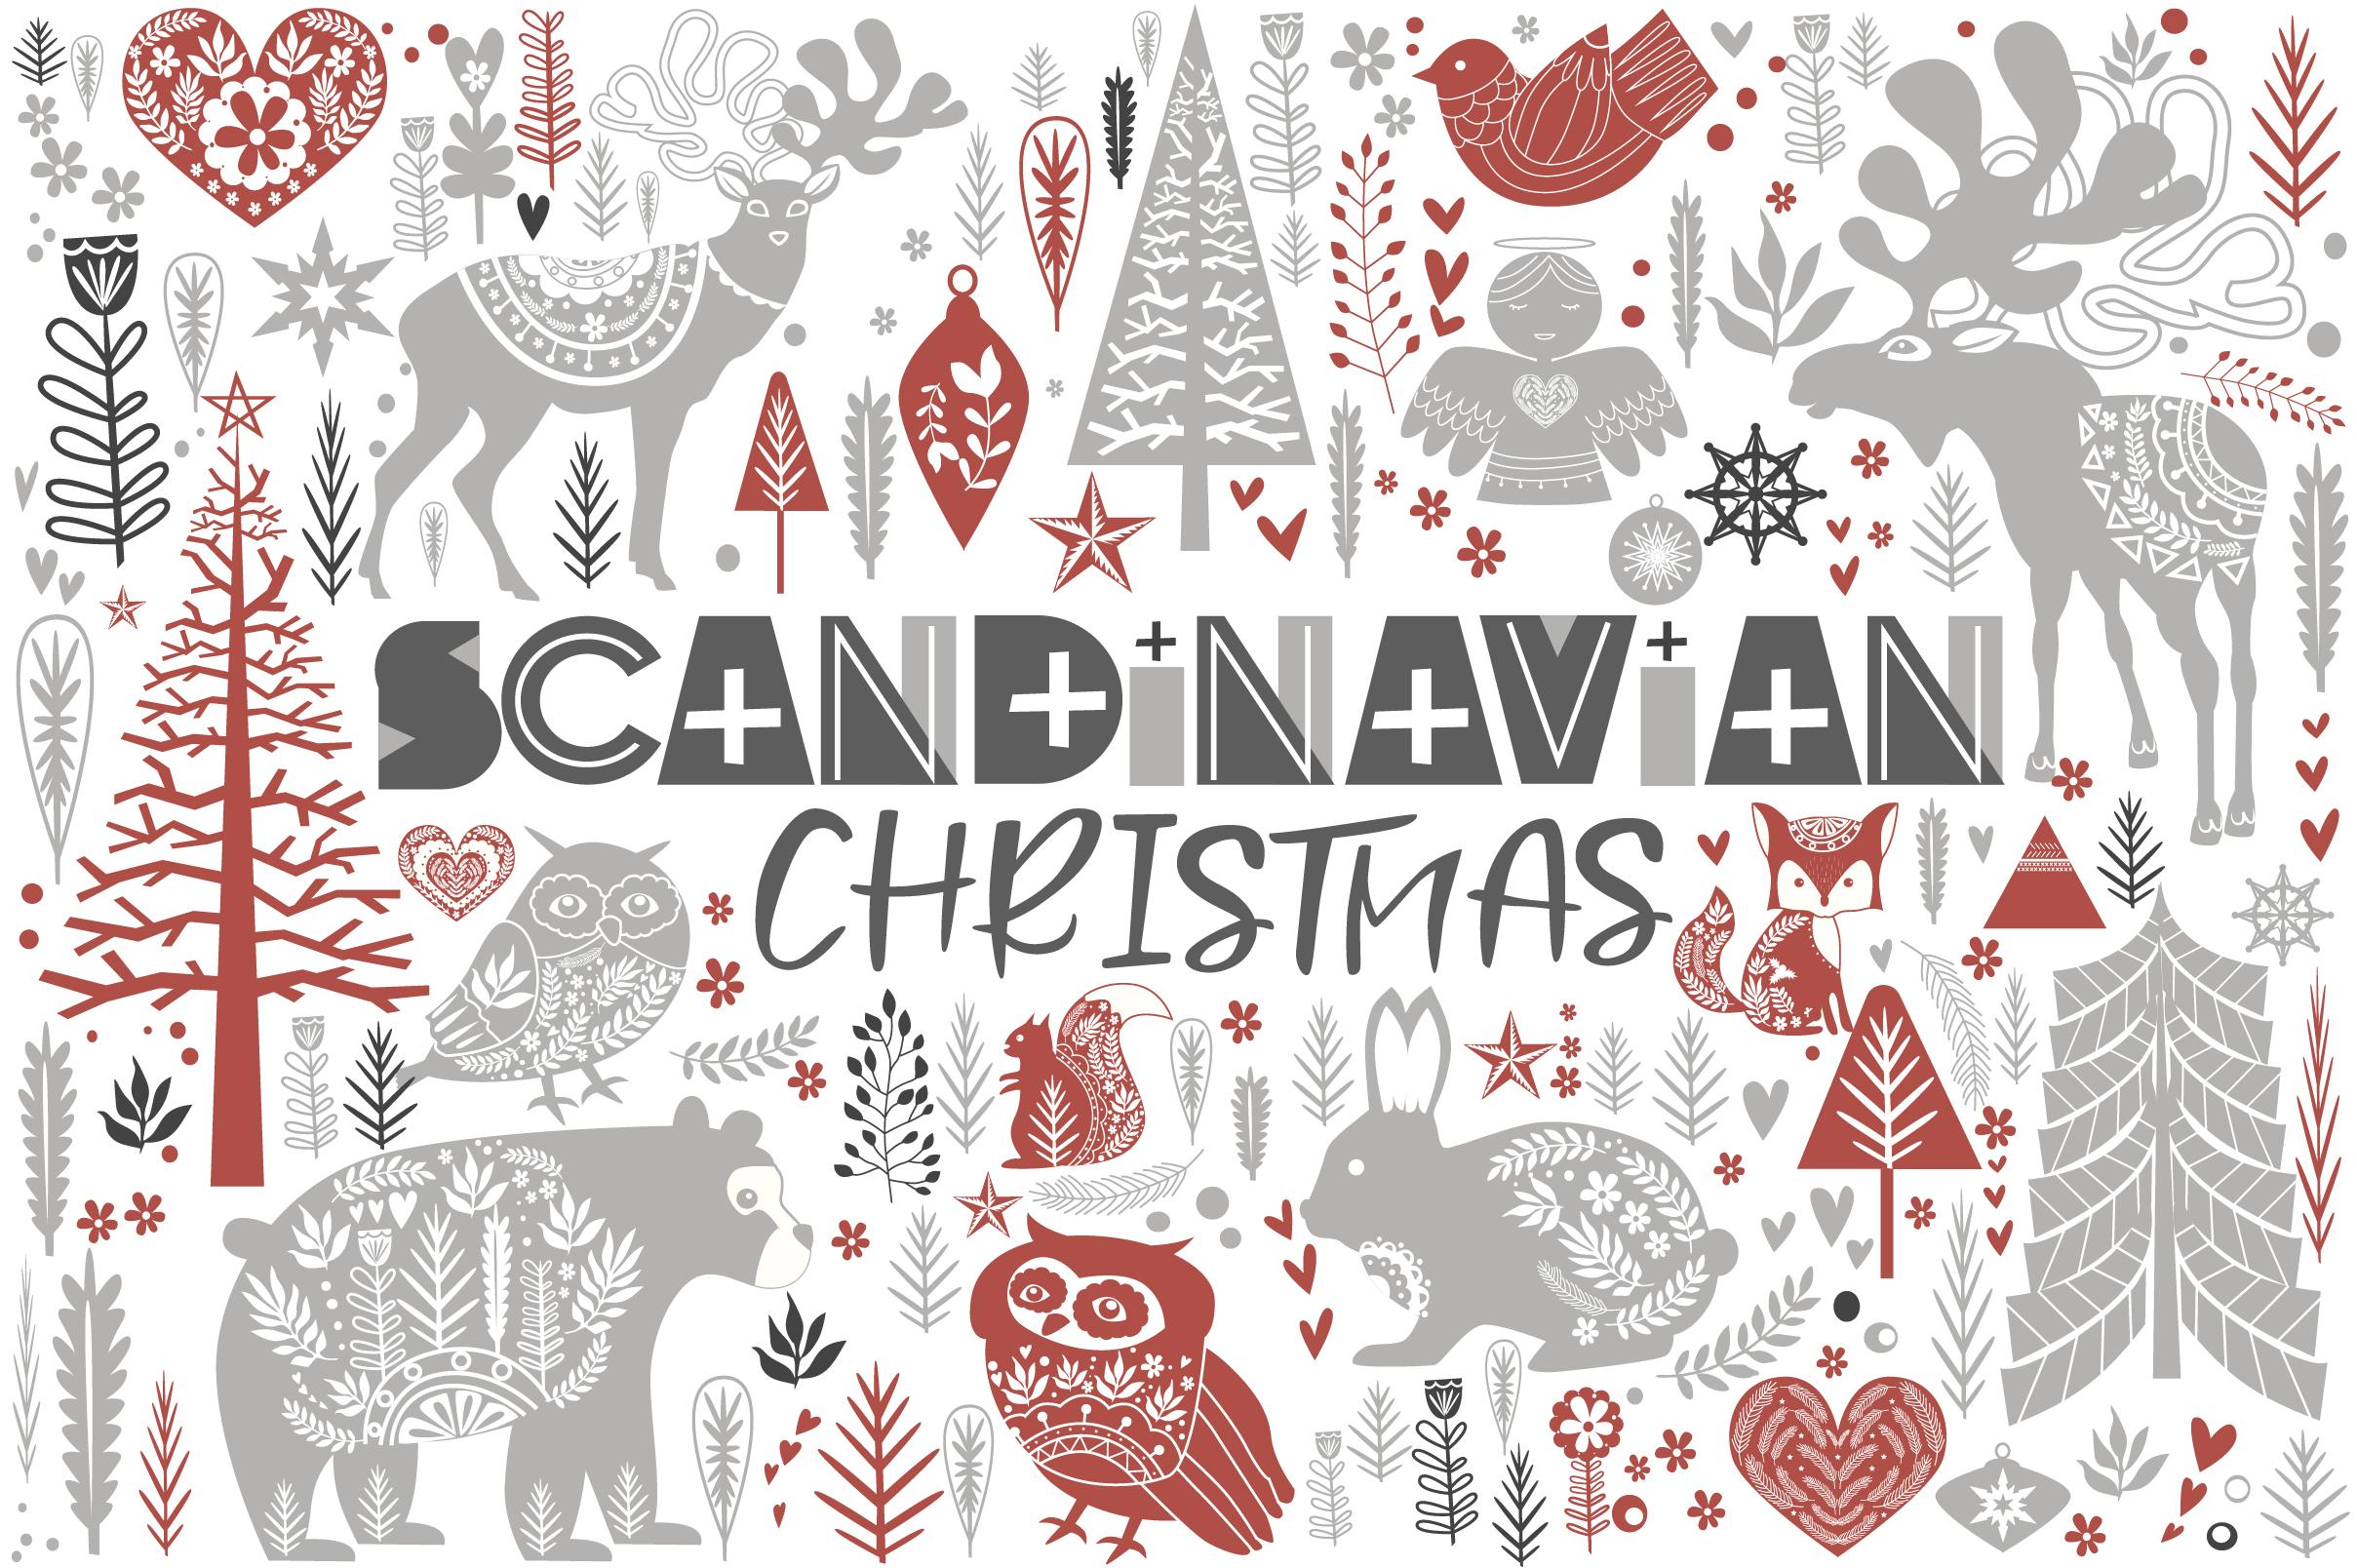 Scandinavian Christmas set example image 1